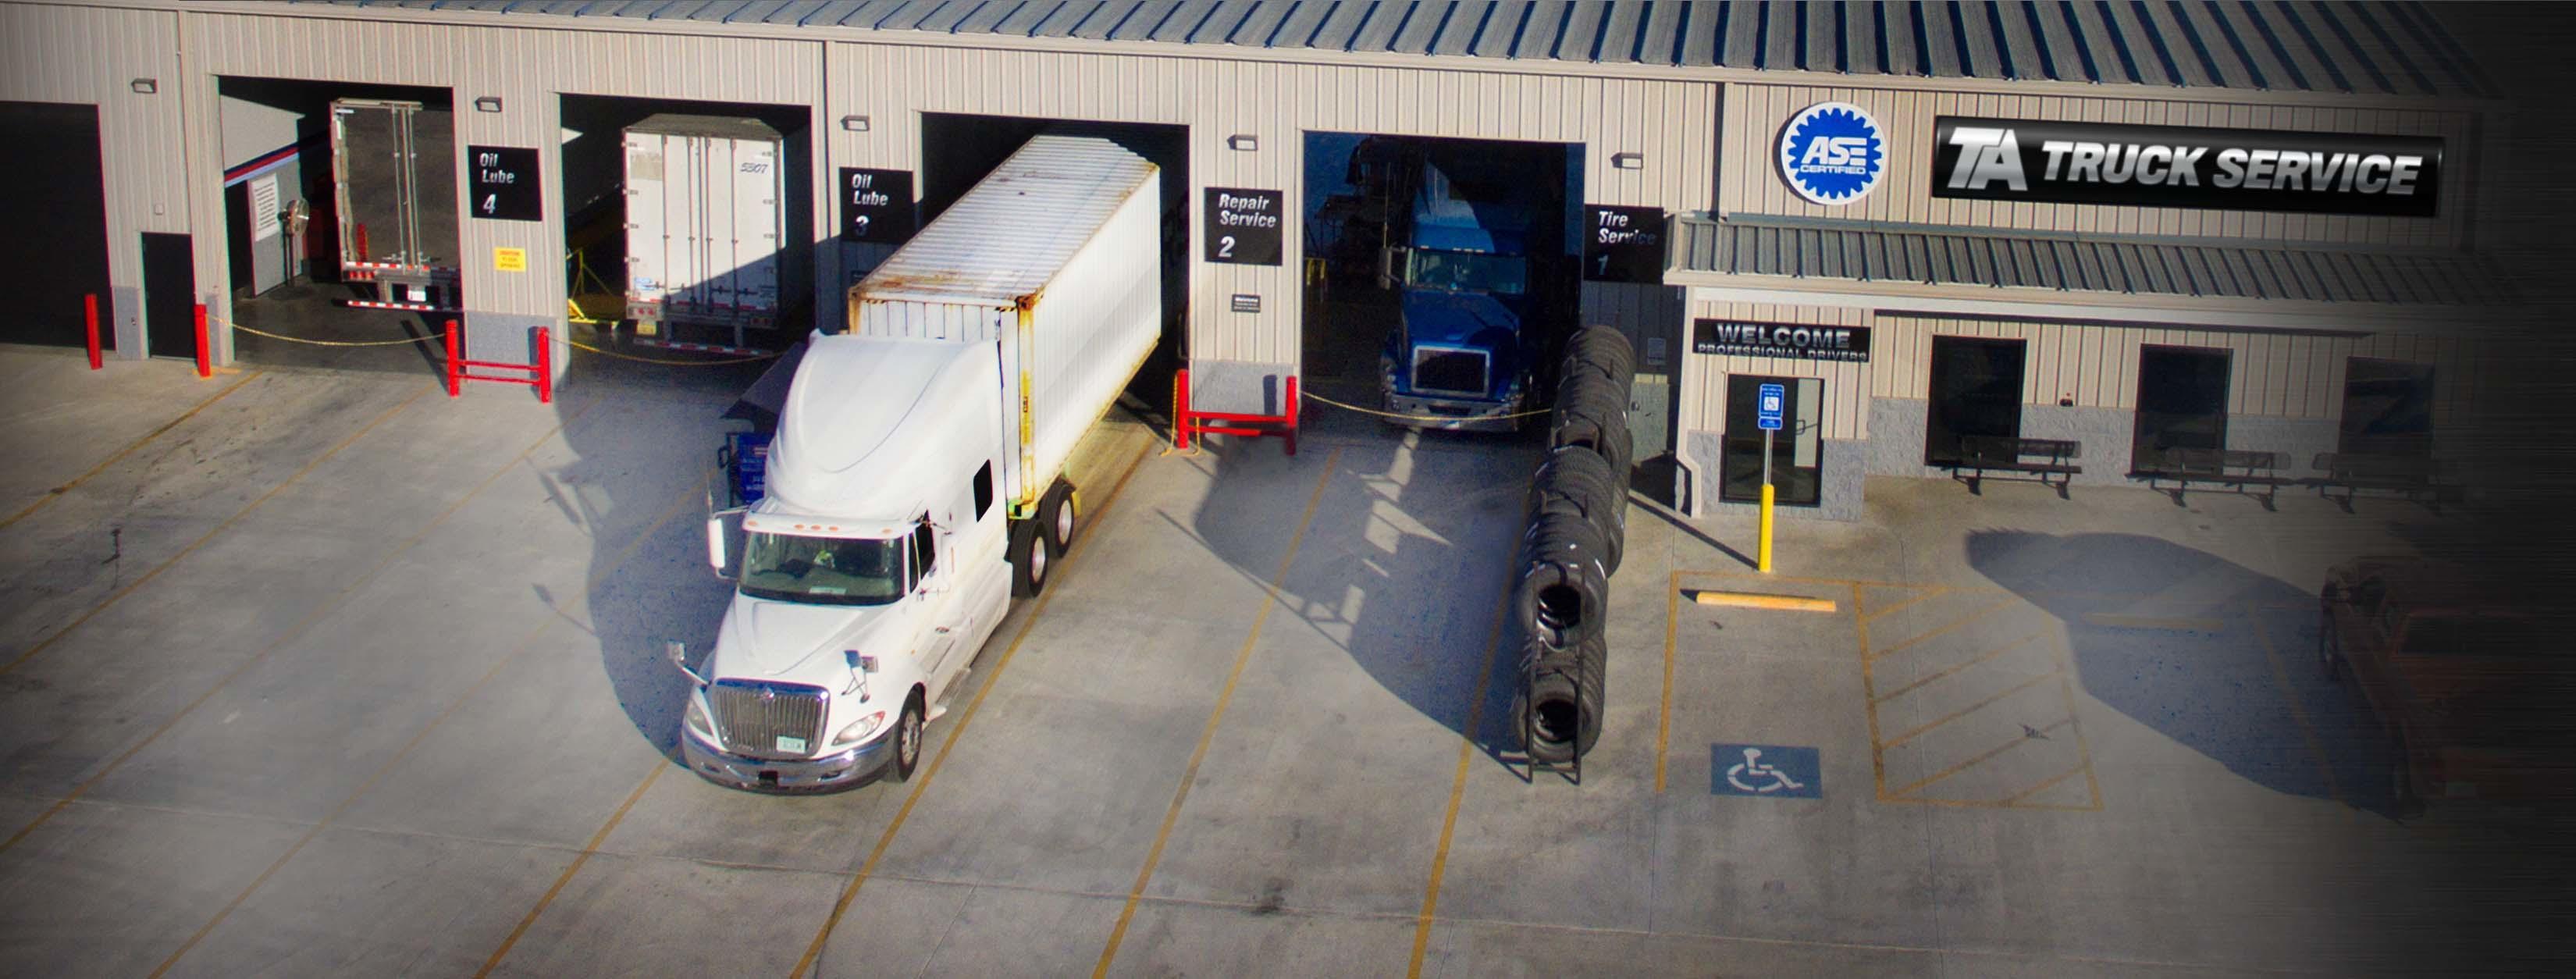 TA Truck Service image 0